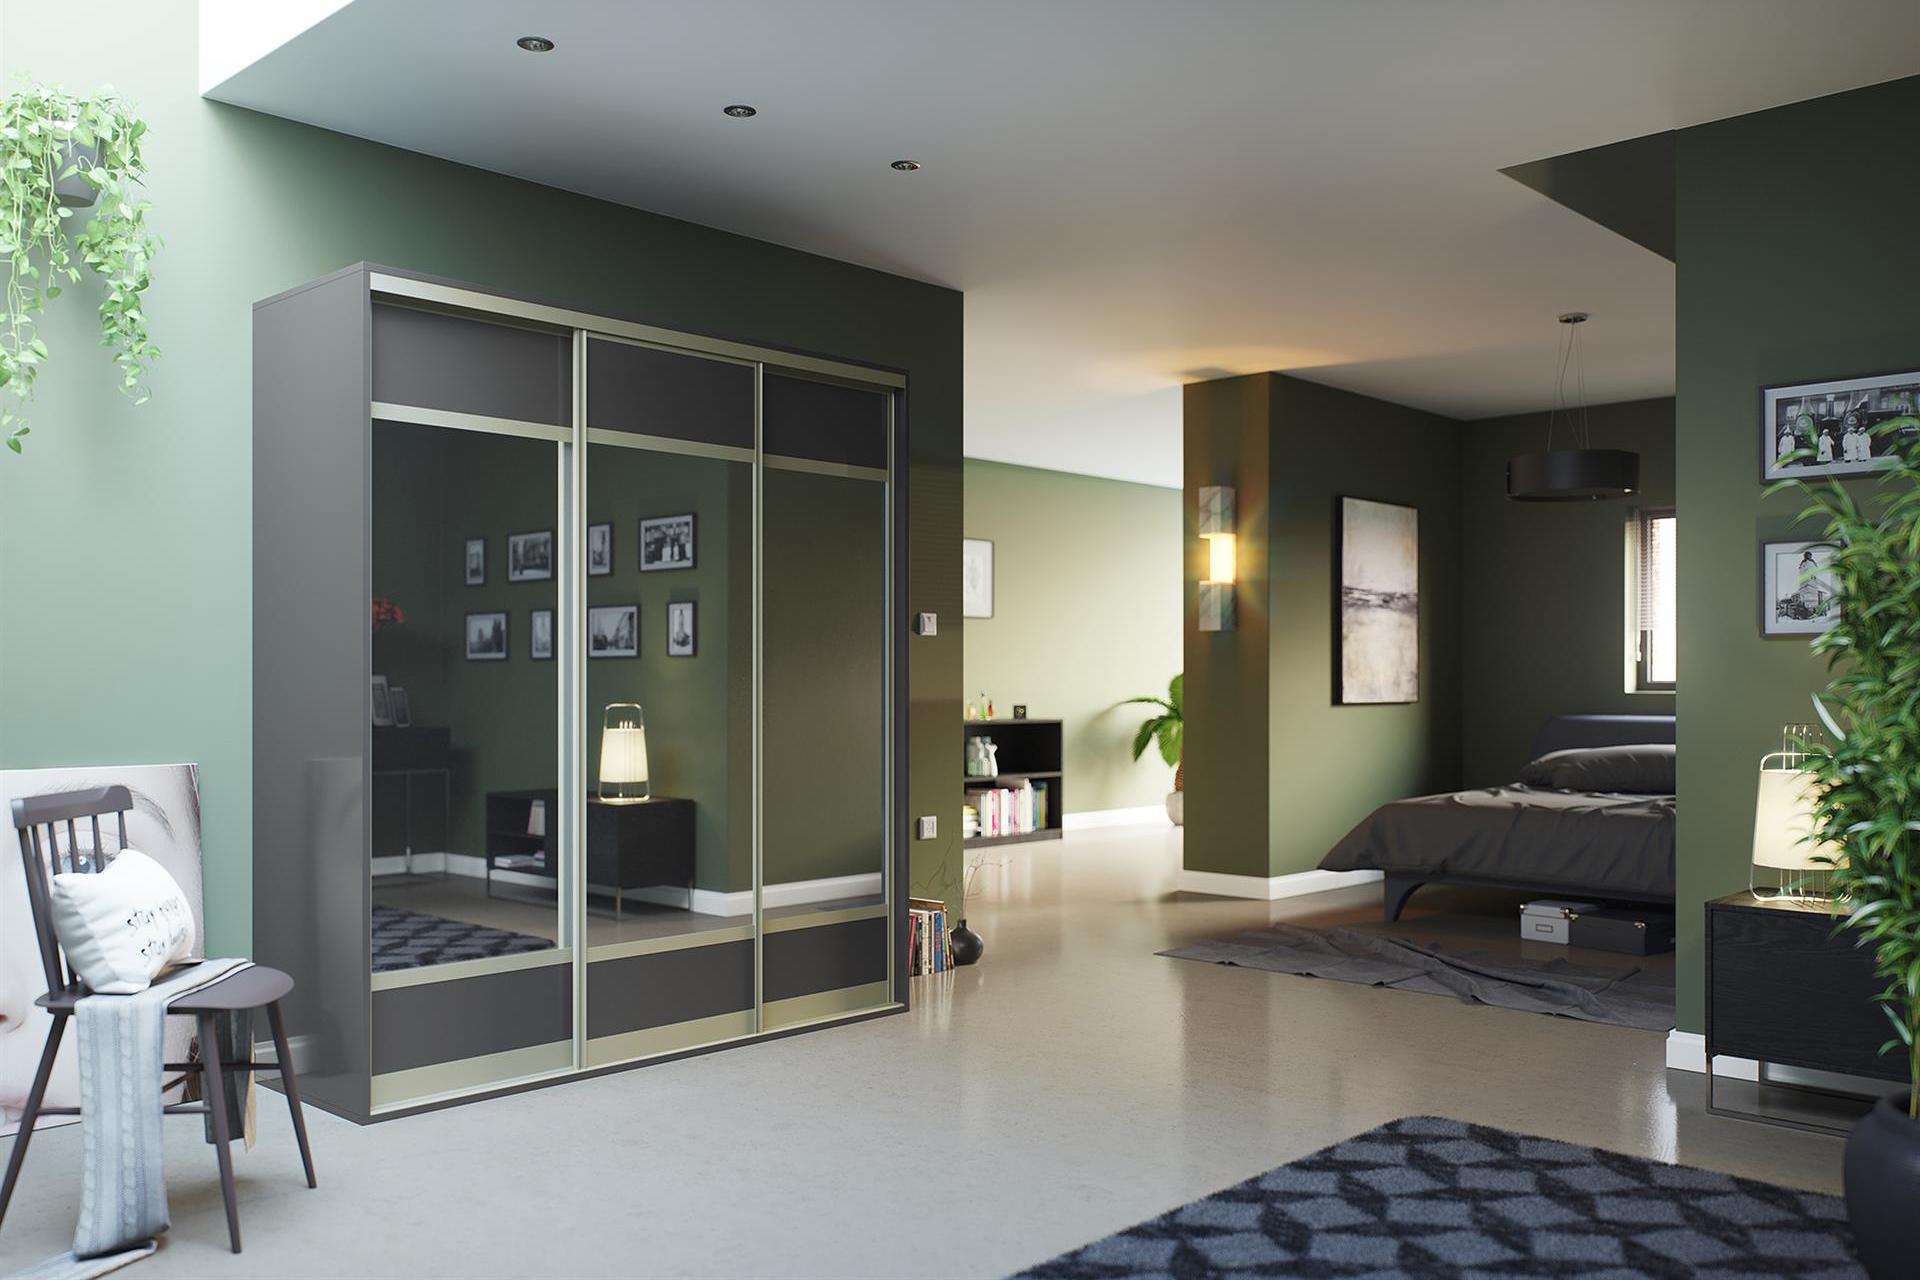 Matt Dust Grey and Mirror 3 Panel (large centre)